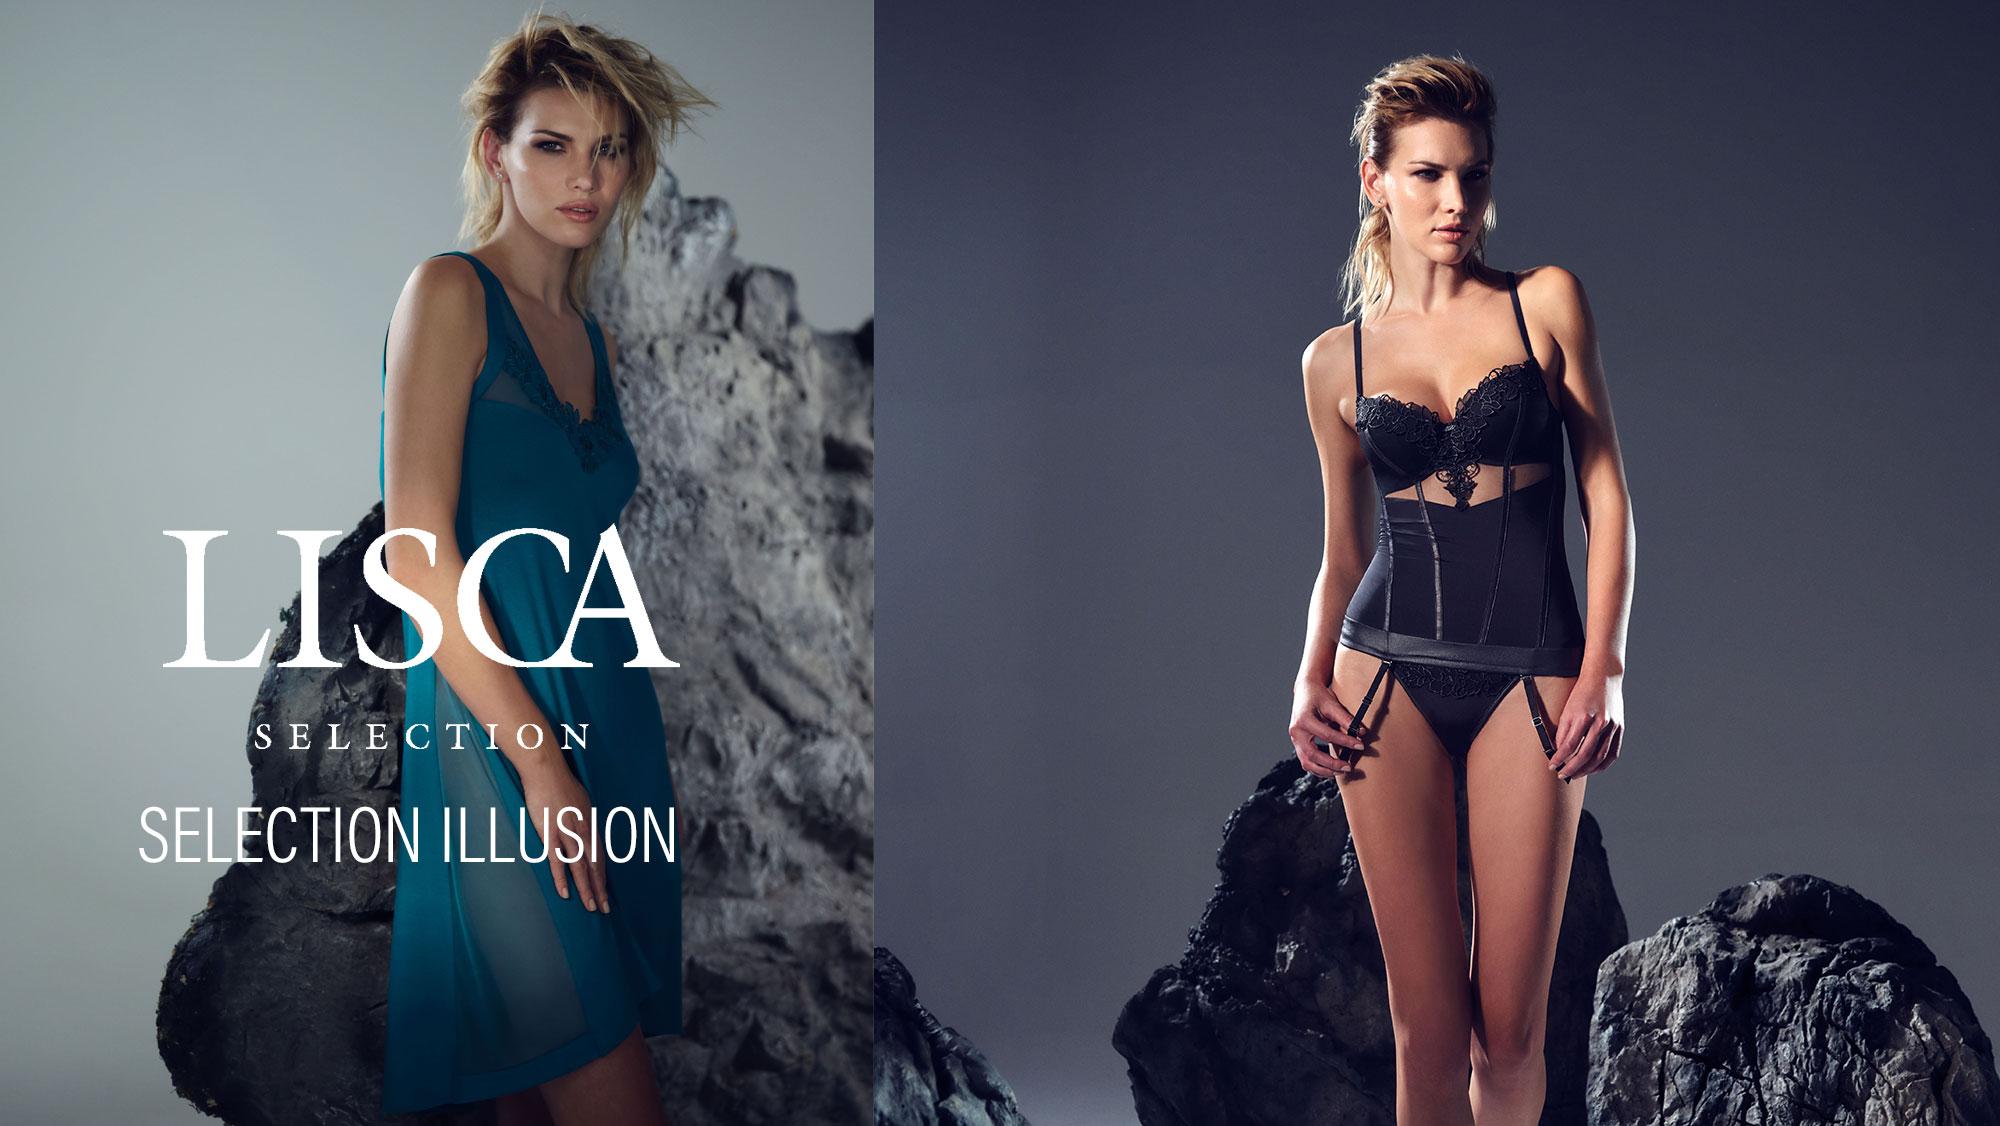 Lisca Selection Illusion